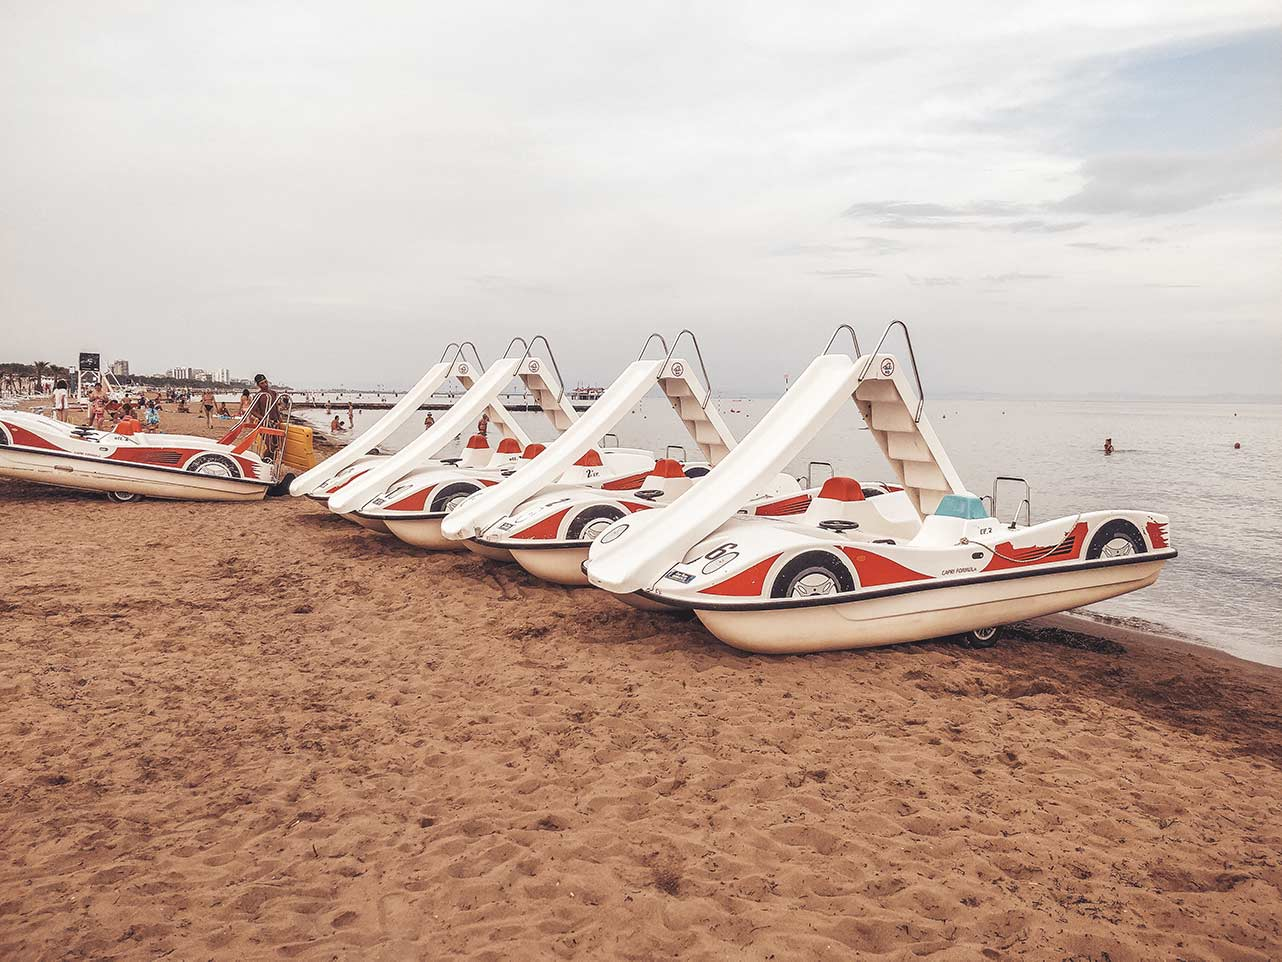 Tretboote mit Rutscha am Strand von Lignano Sabbiadoro